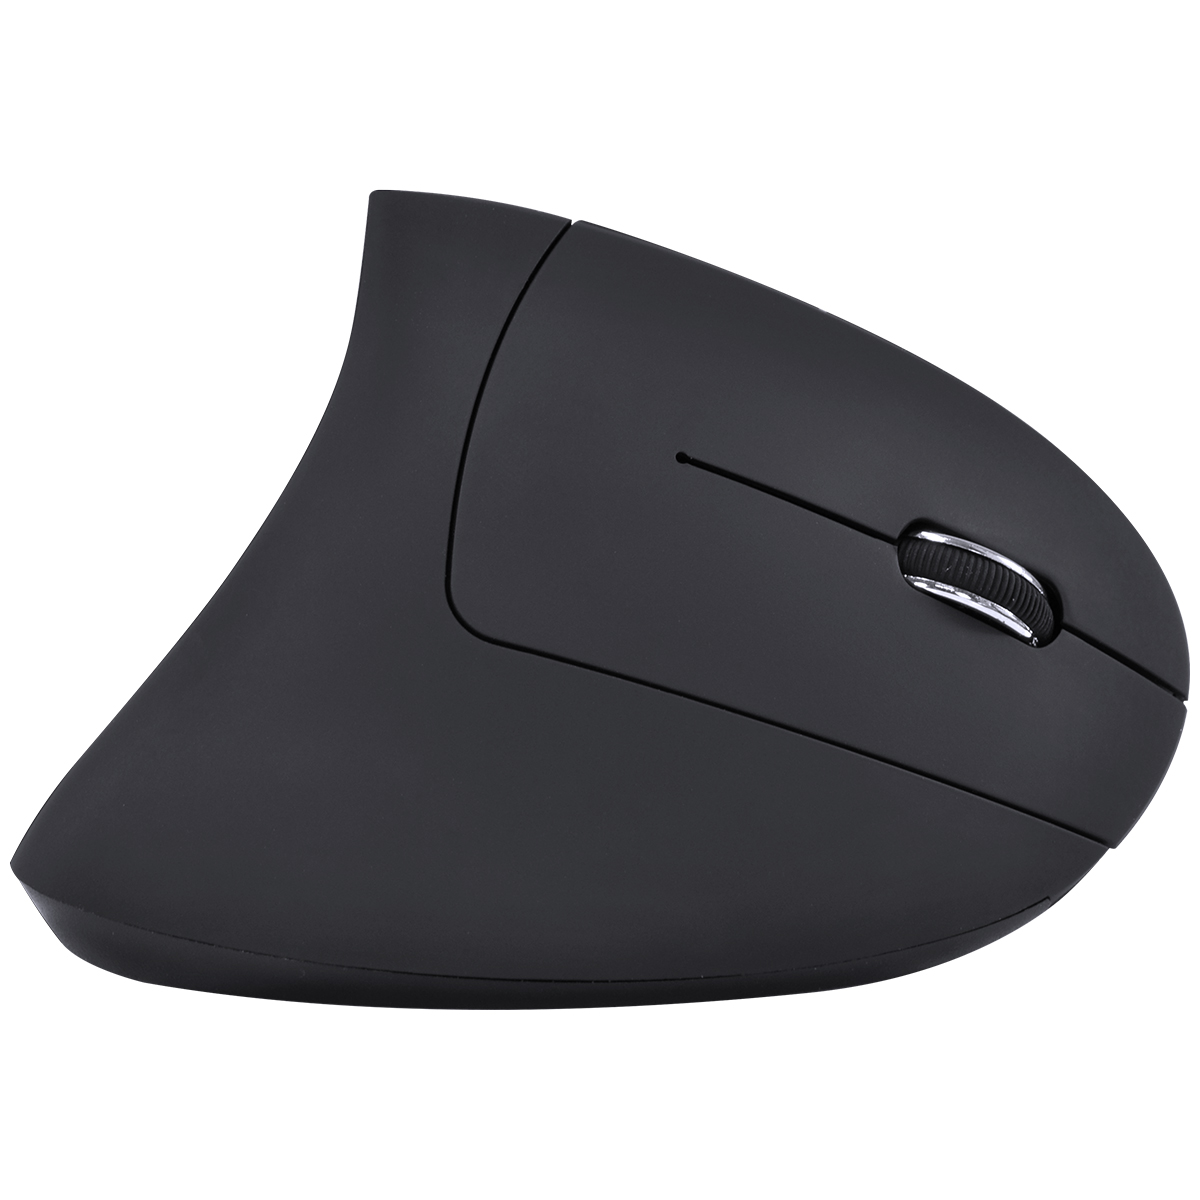 Mouse Vertical Vinik Power Fit Preto 1600DPI - PM300 - PC FLORIPA